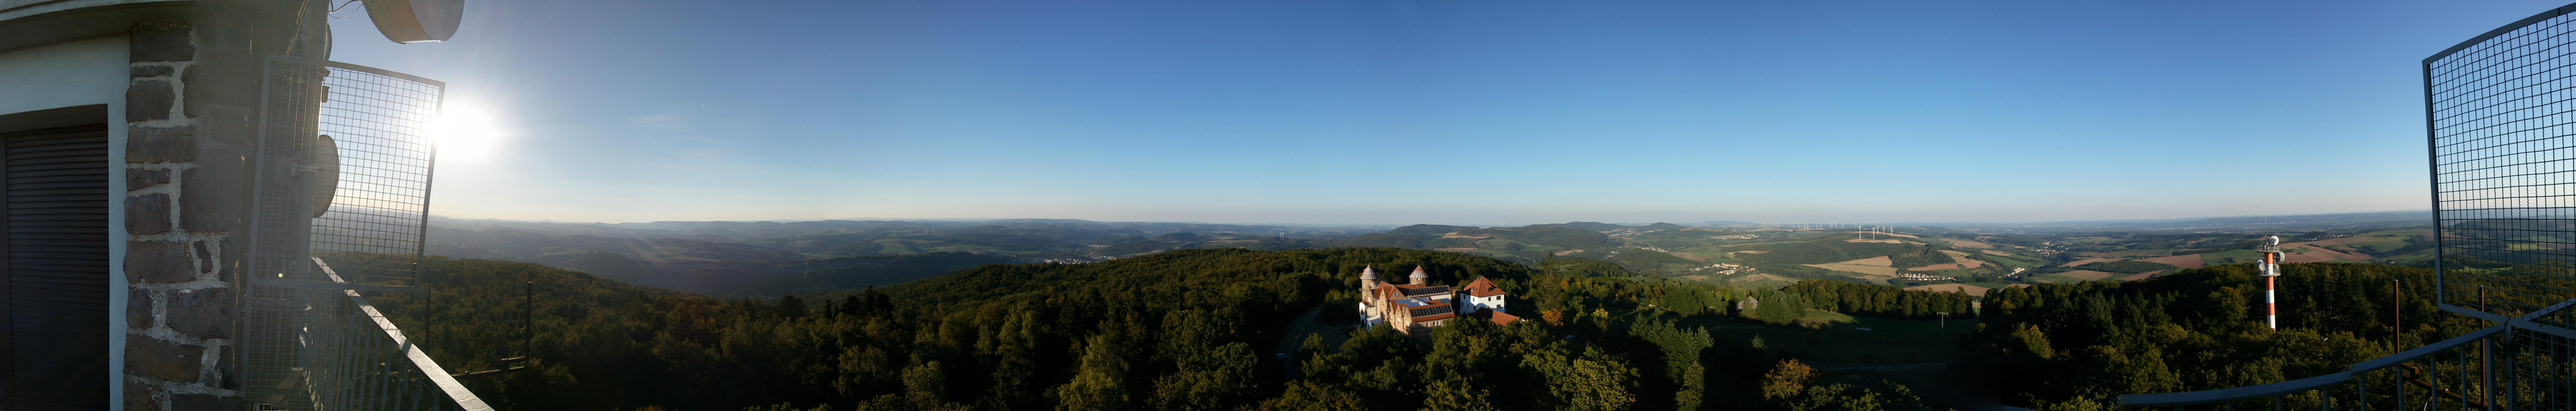 DB0WP Potzberg Panorama2